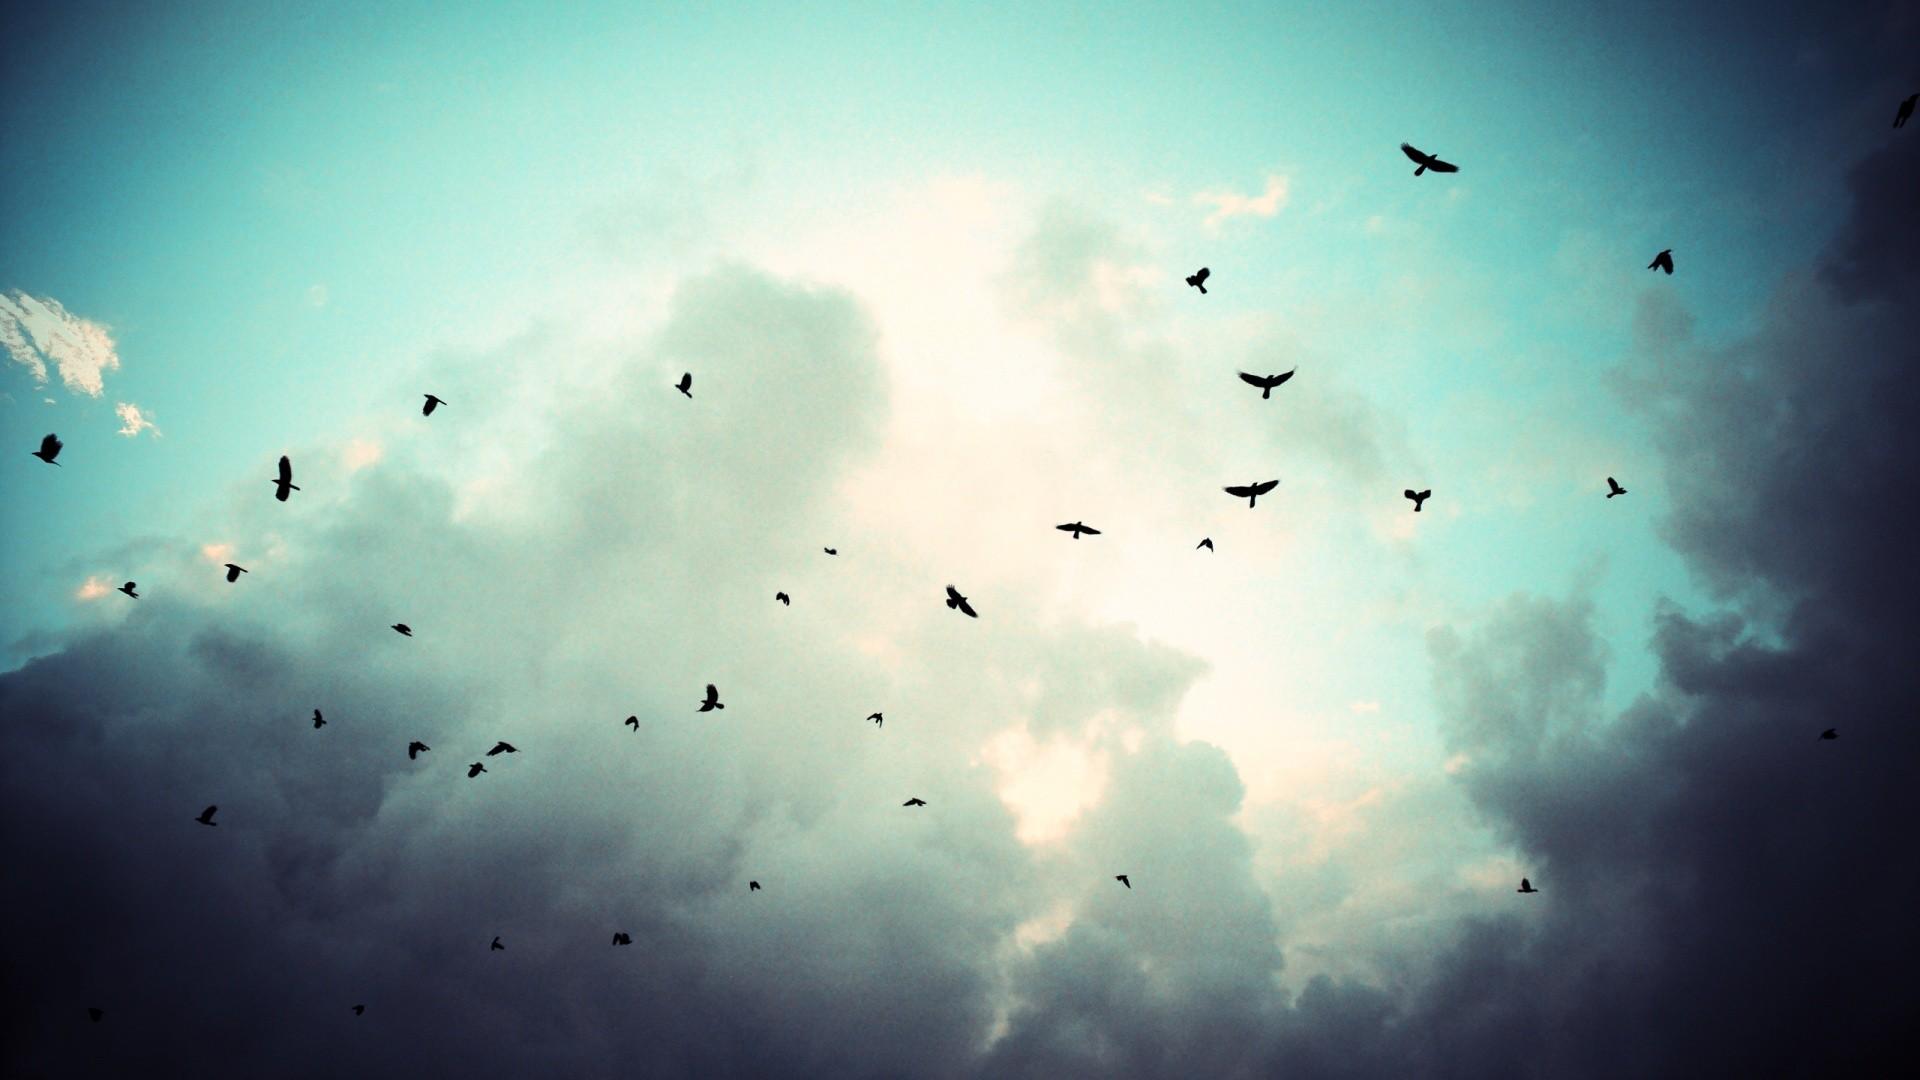 birds flying in cloudy sky hd wallpapers